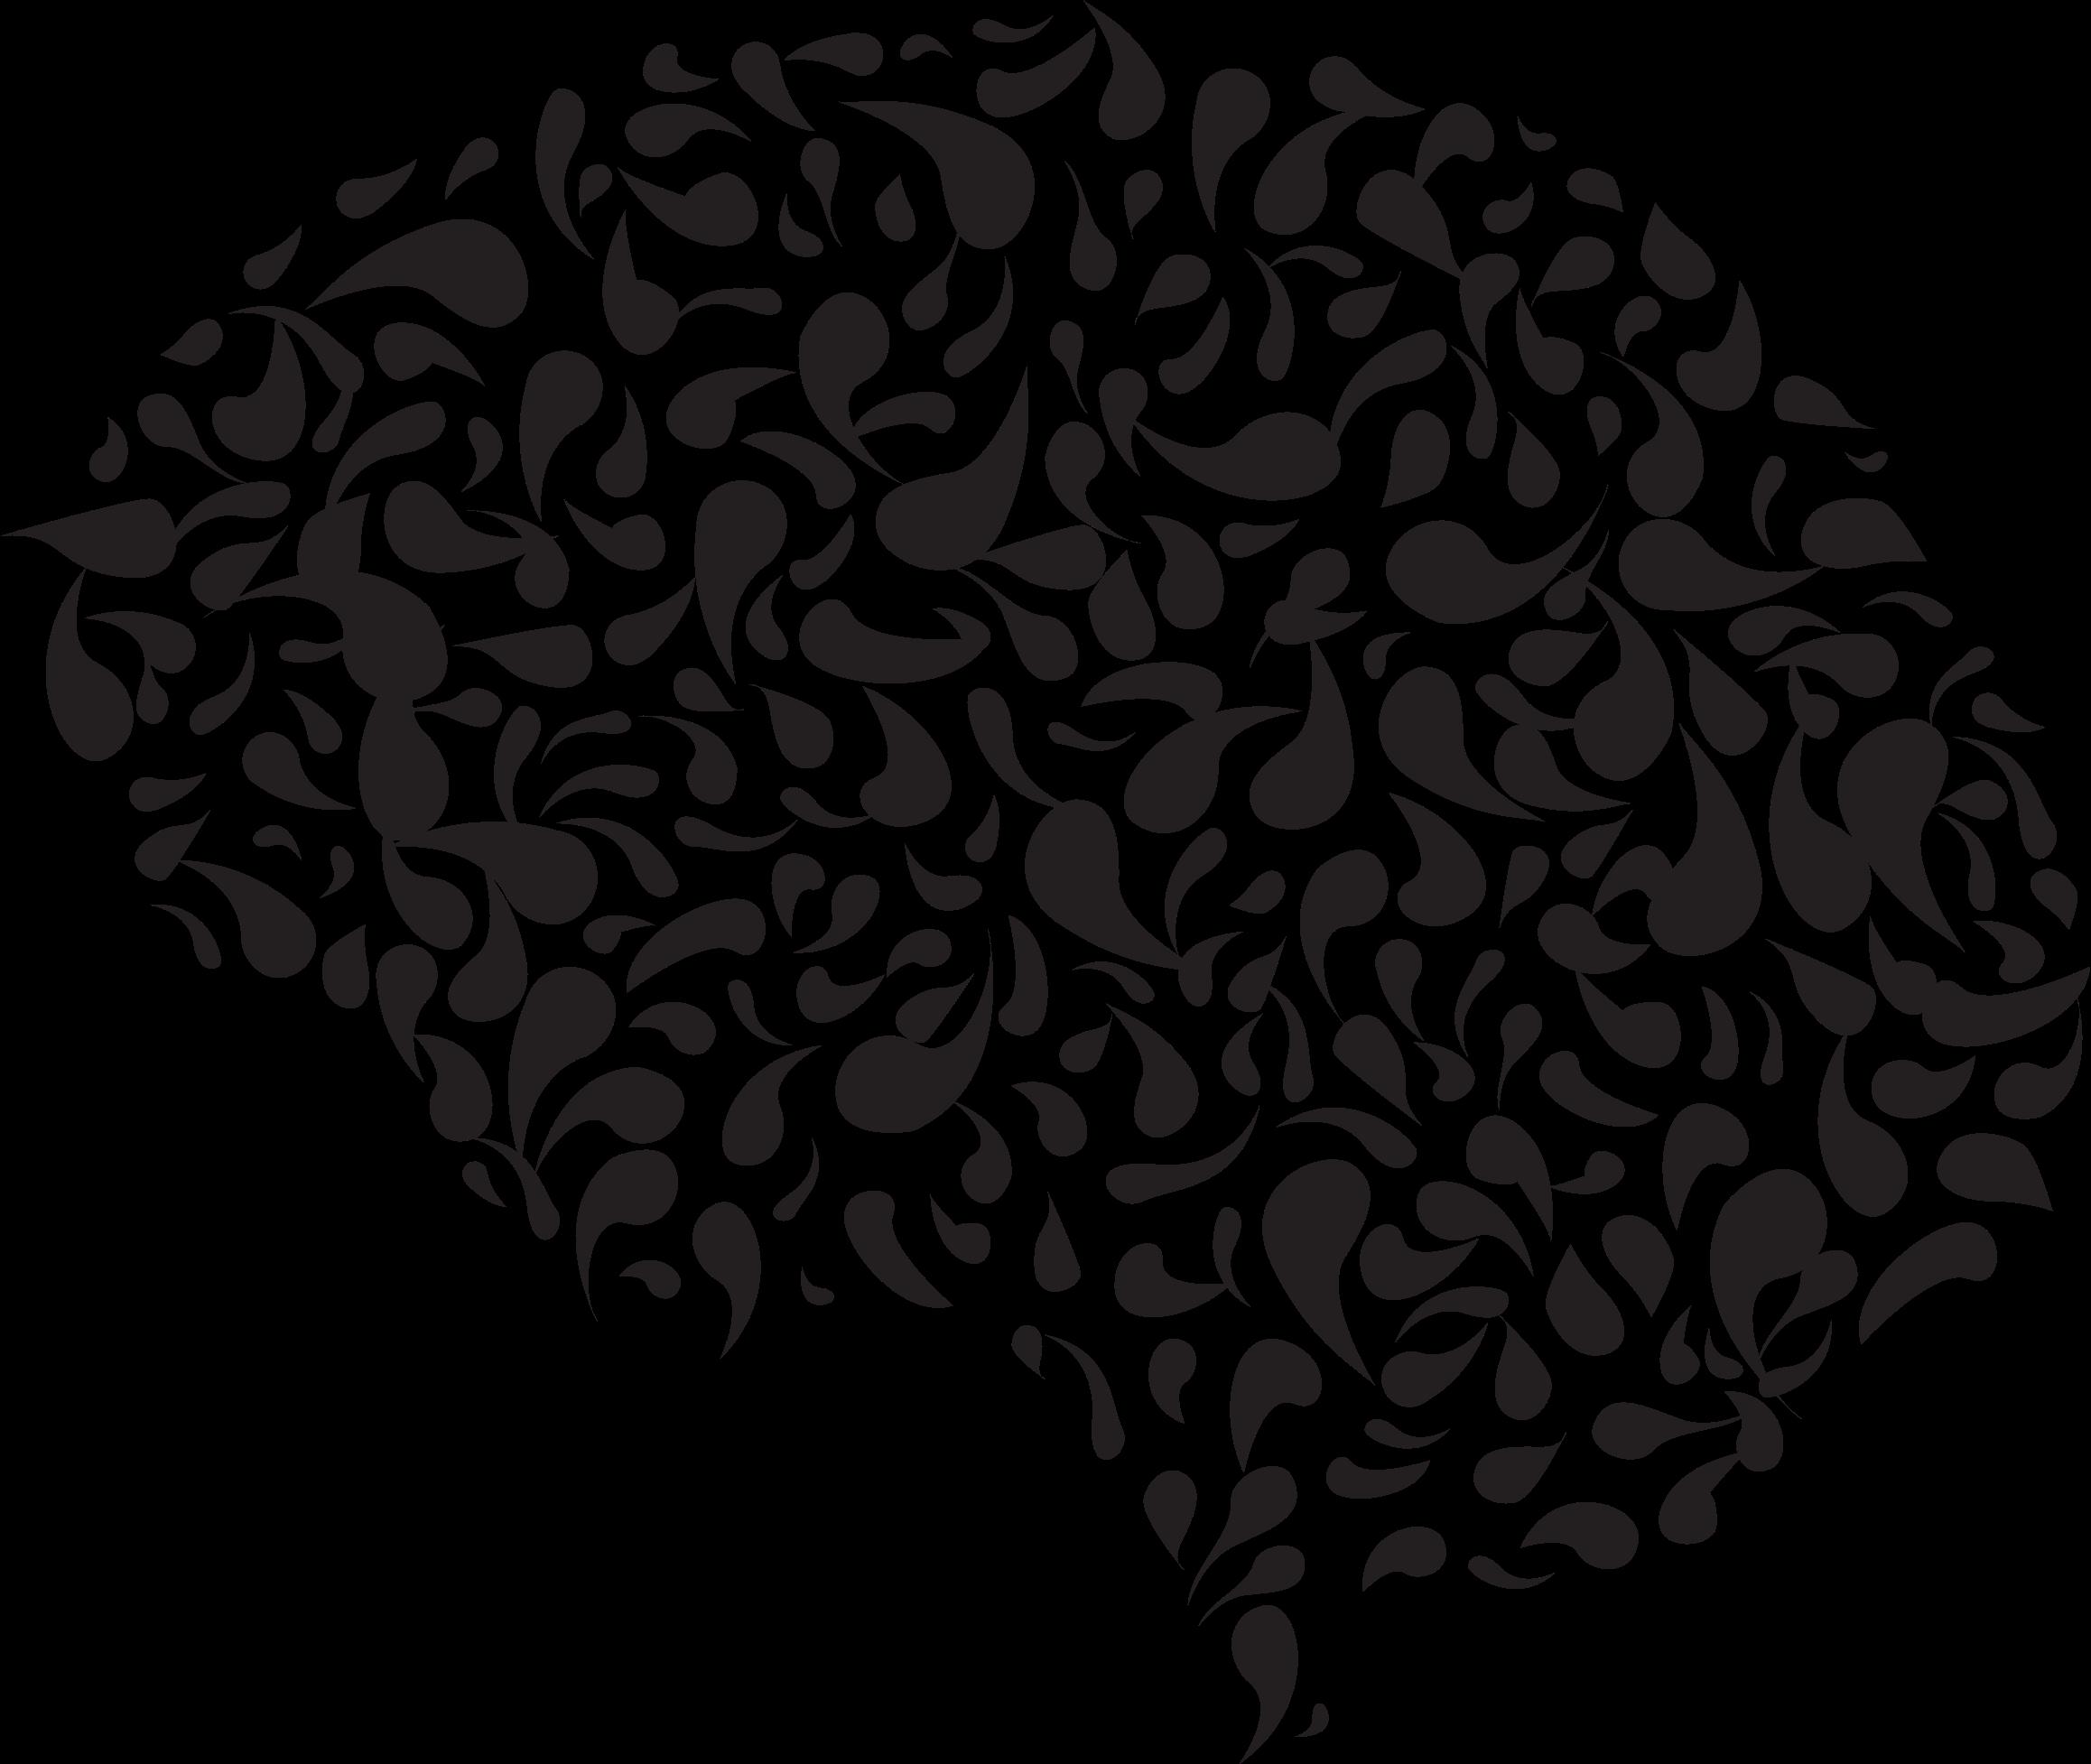 Drops brain big image. Psychology clipart abstract art